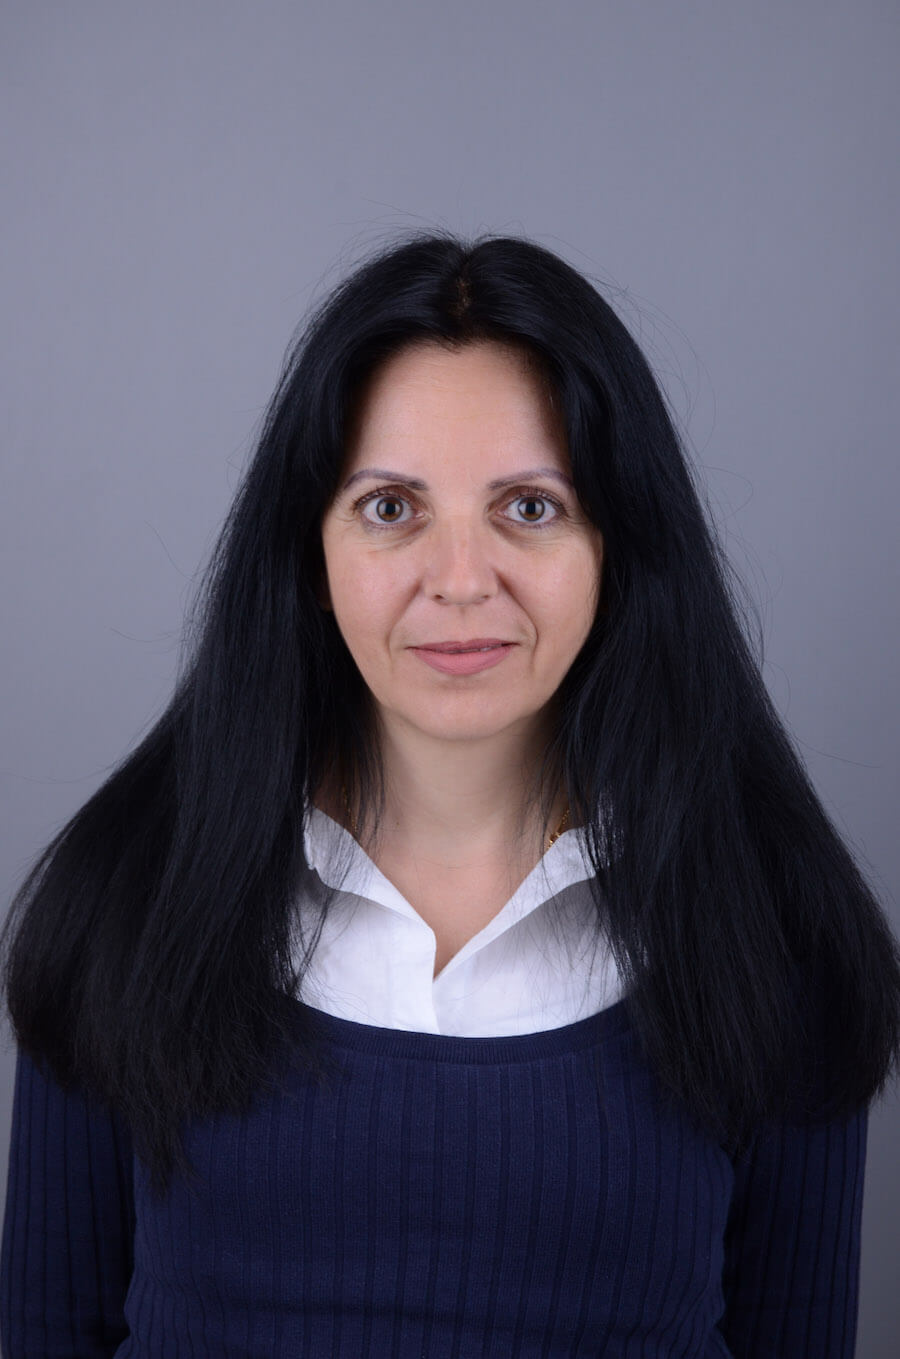 changeislife-ekip-kalina-ivanova